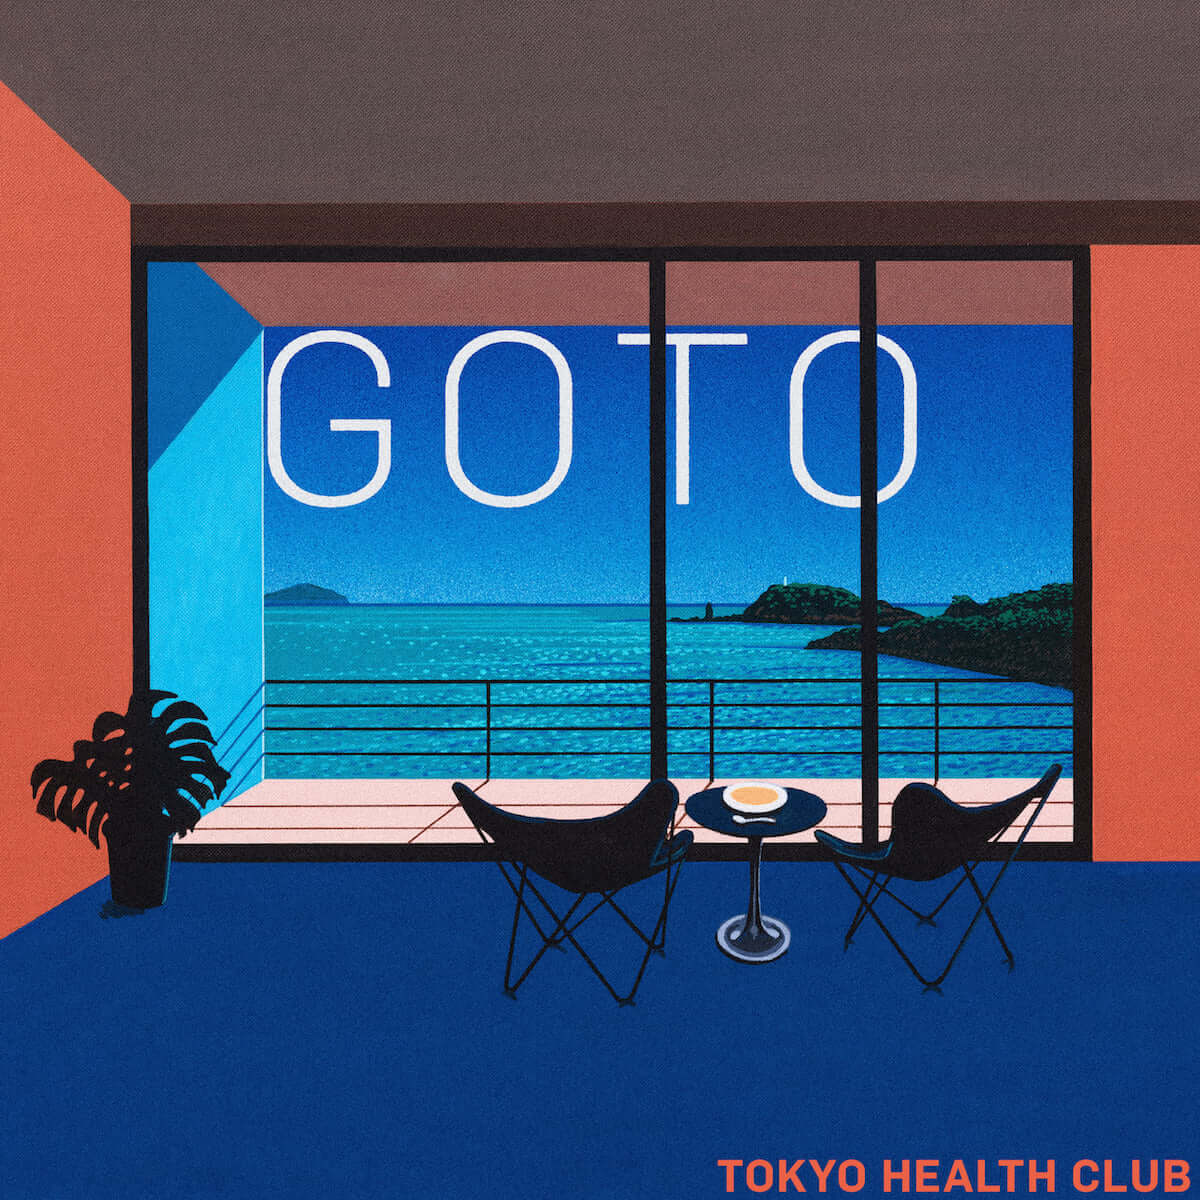 TOKYO HEALTH CLUBによる平成最後の旅歌「GO TO」がリリース music181026-tokyohealthclub-1-1200x1200